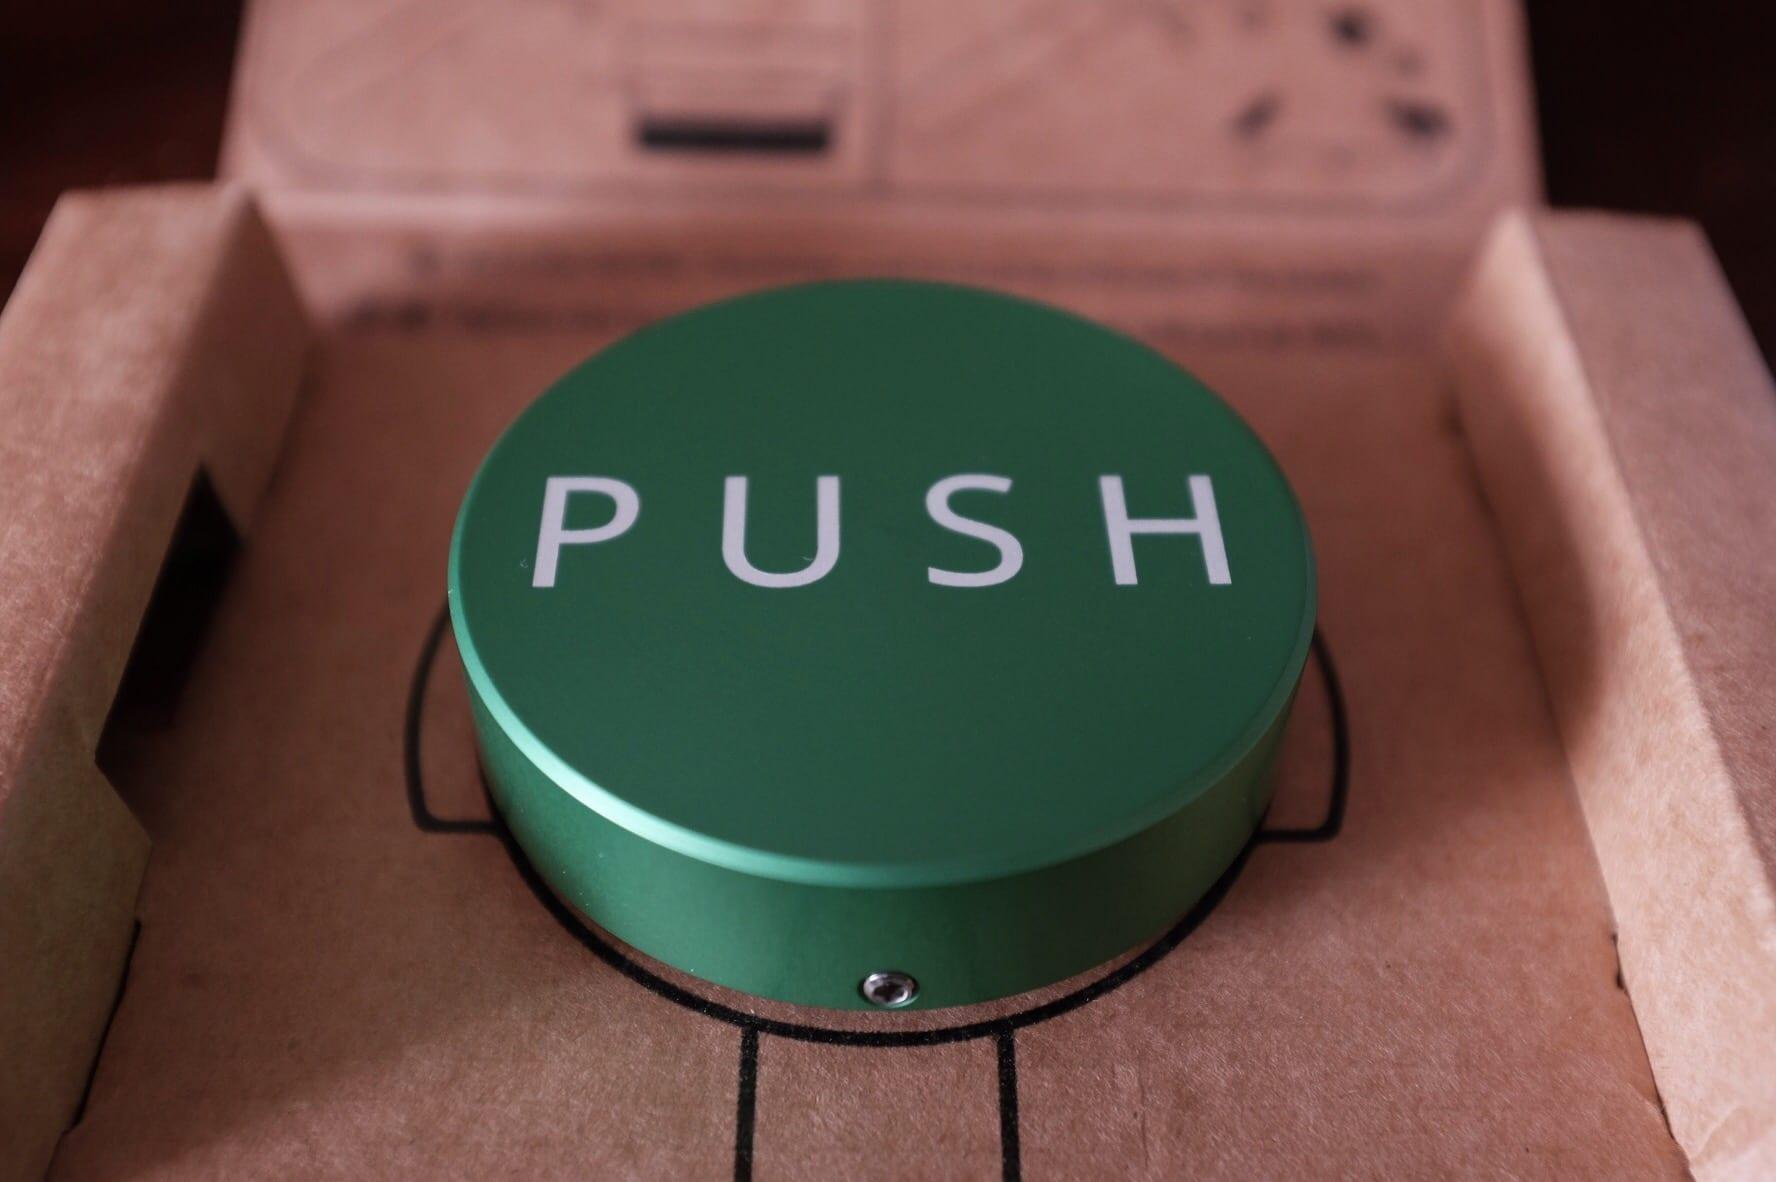 PUSH Tamper